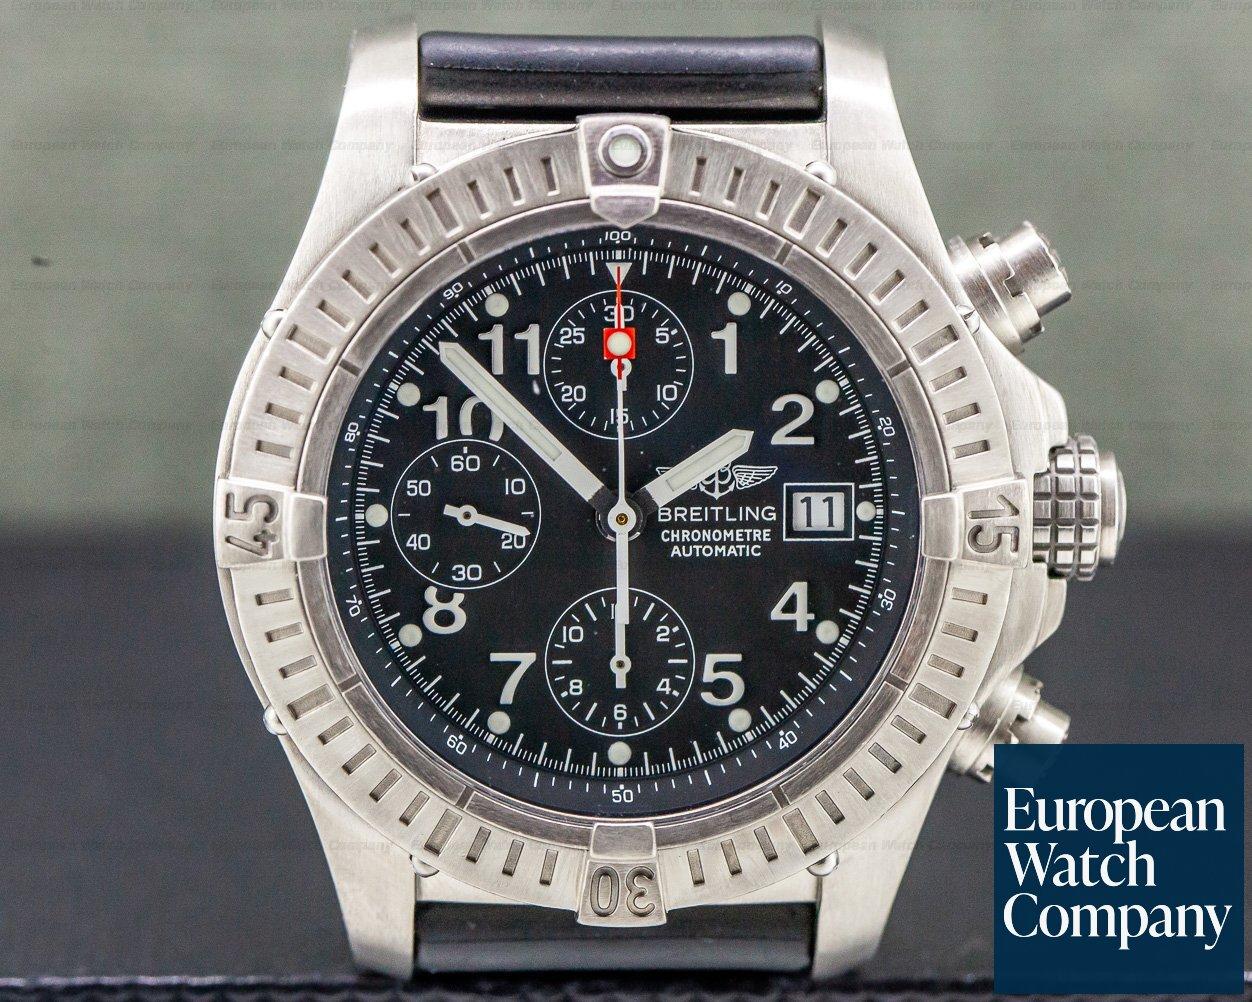 Breitling E13360 Aeromarine Chronograph Avenger Black Dial / Titanium